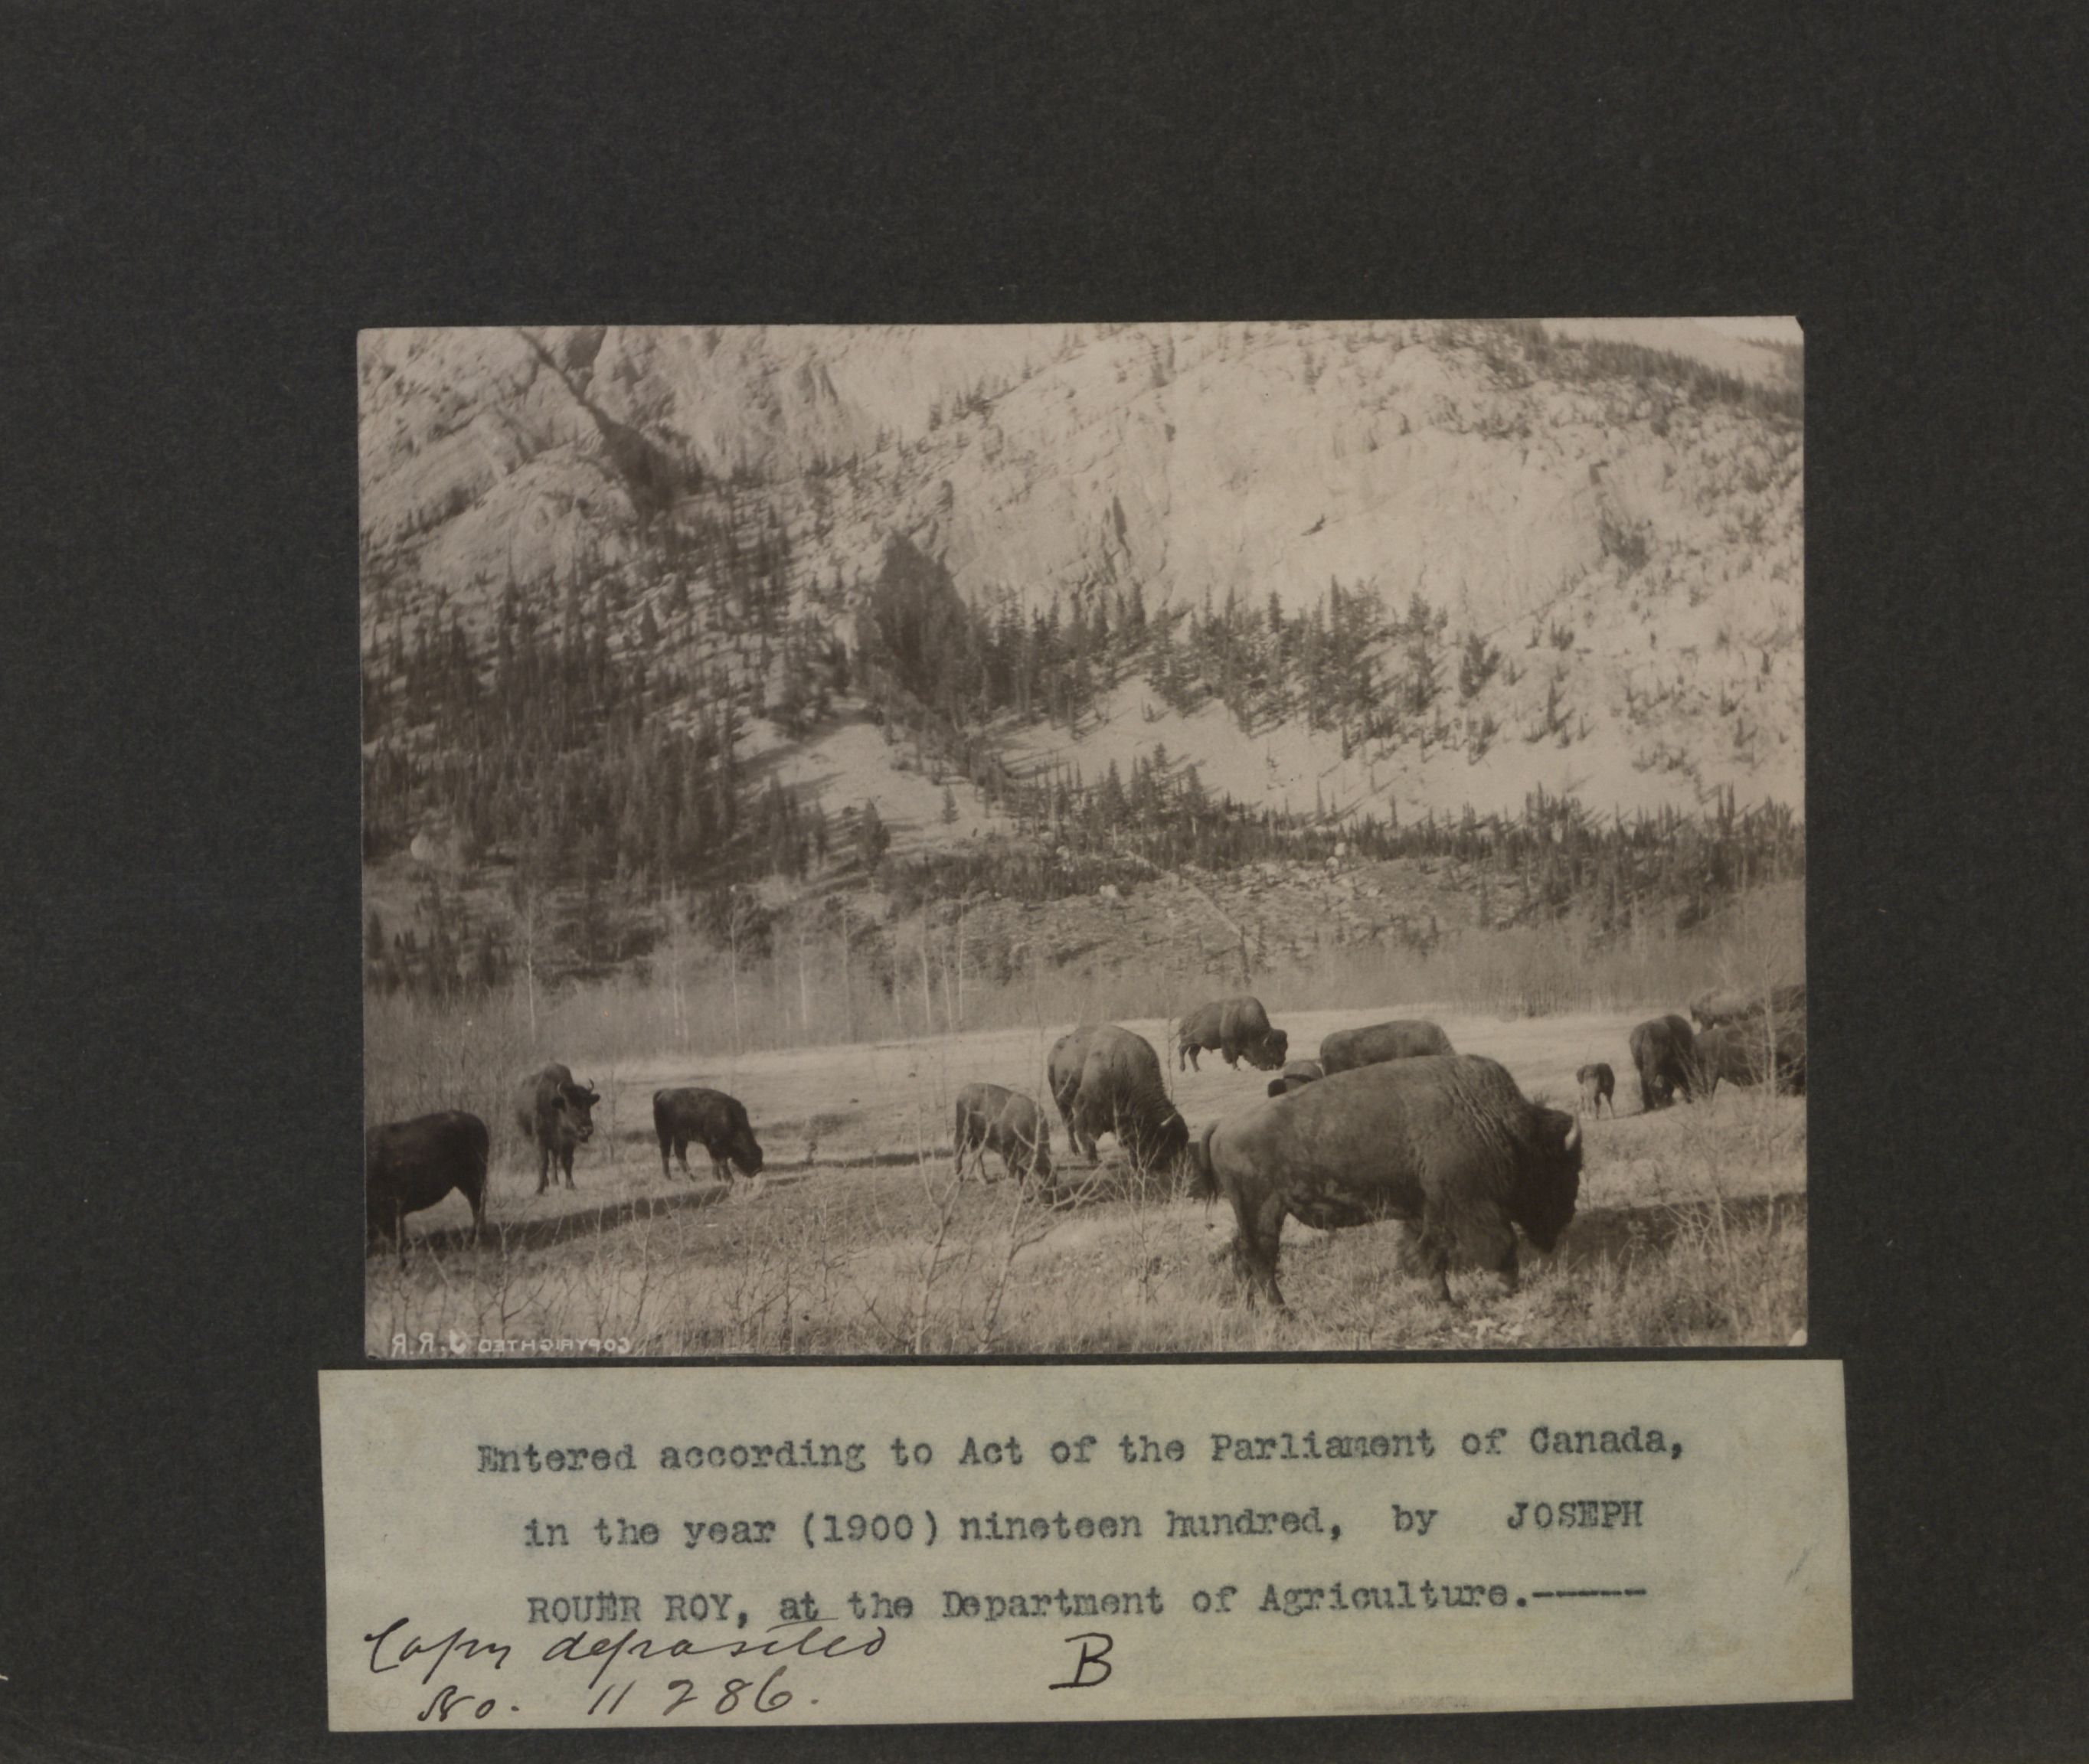 Buffalo herd at the foot of a mountain. Long description available.